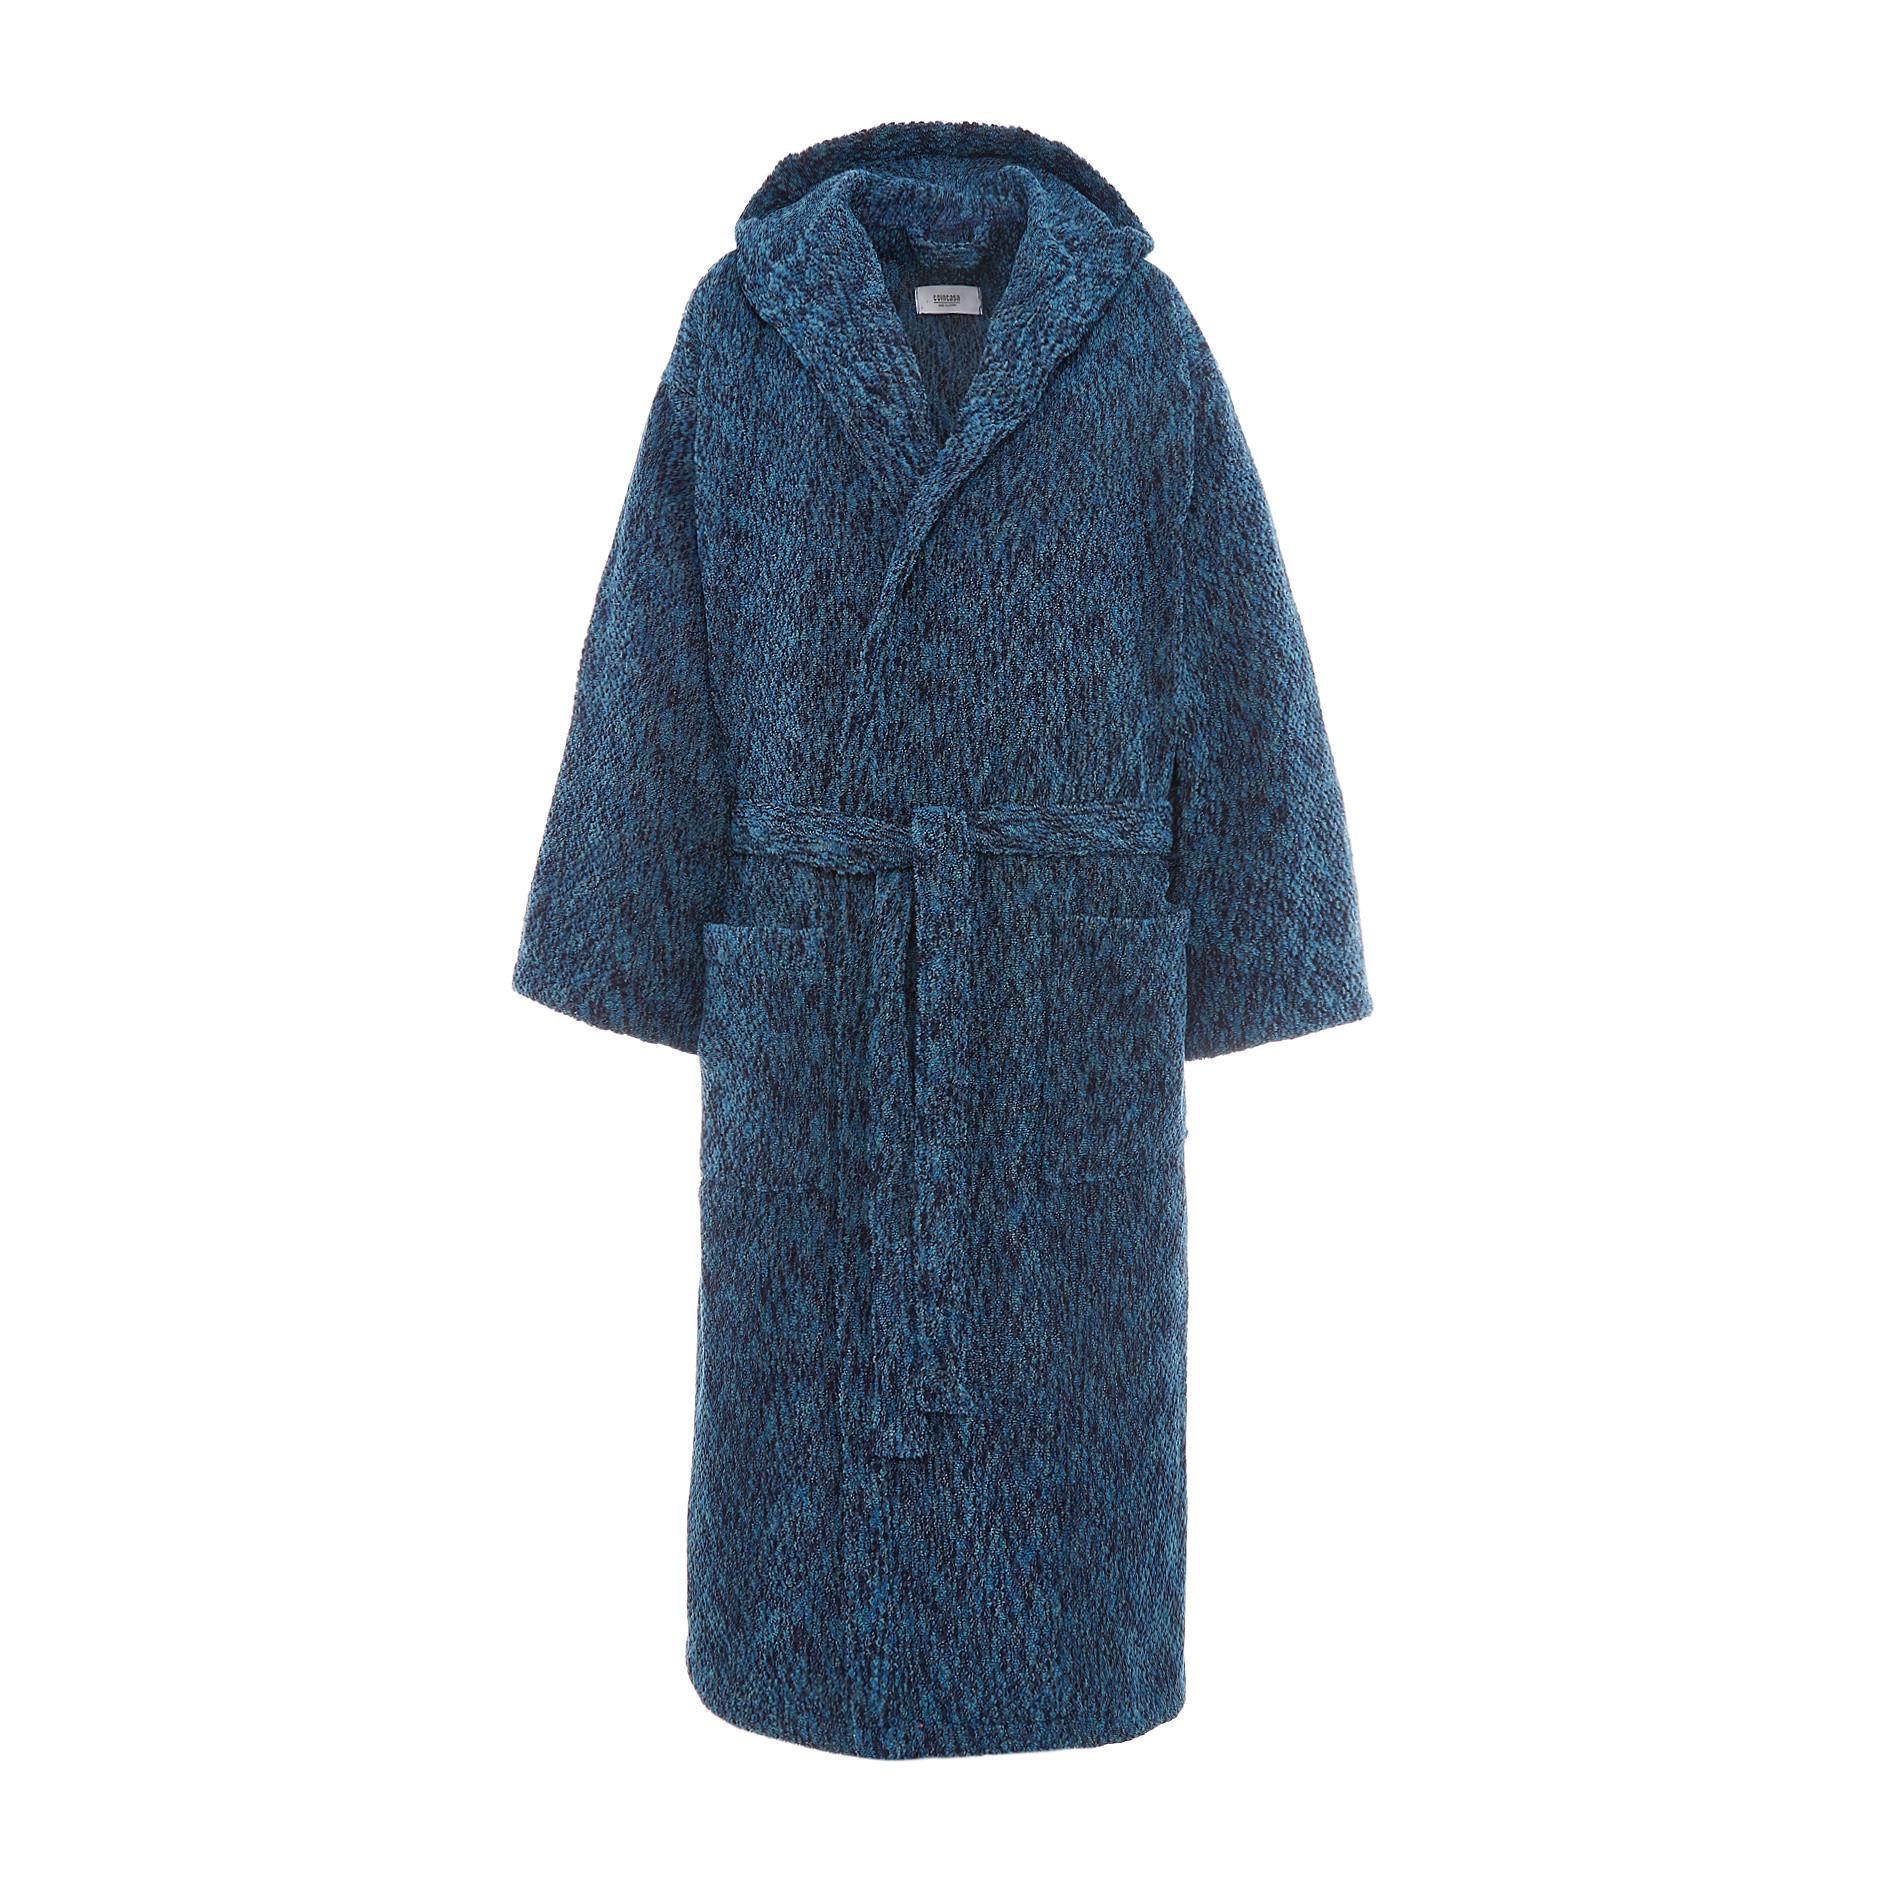 Accappatoio spugna di cotone effetto melange, Blu, large image number 1